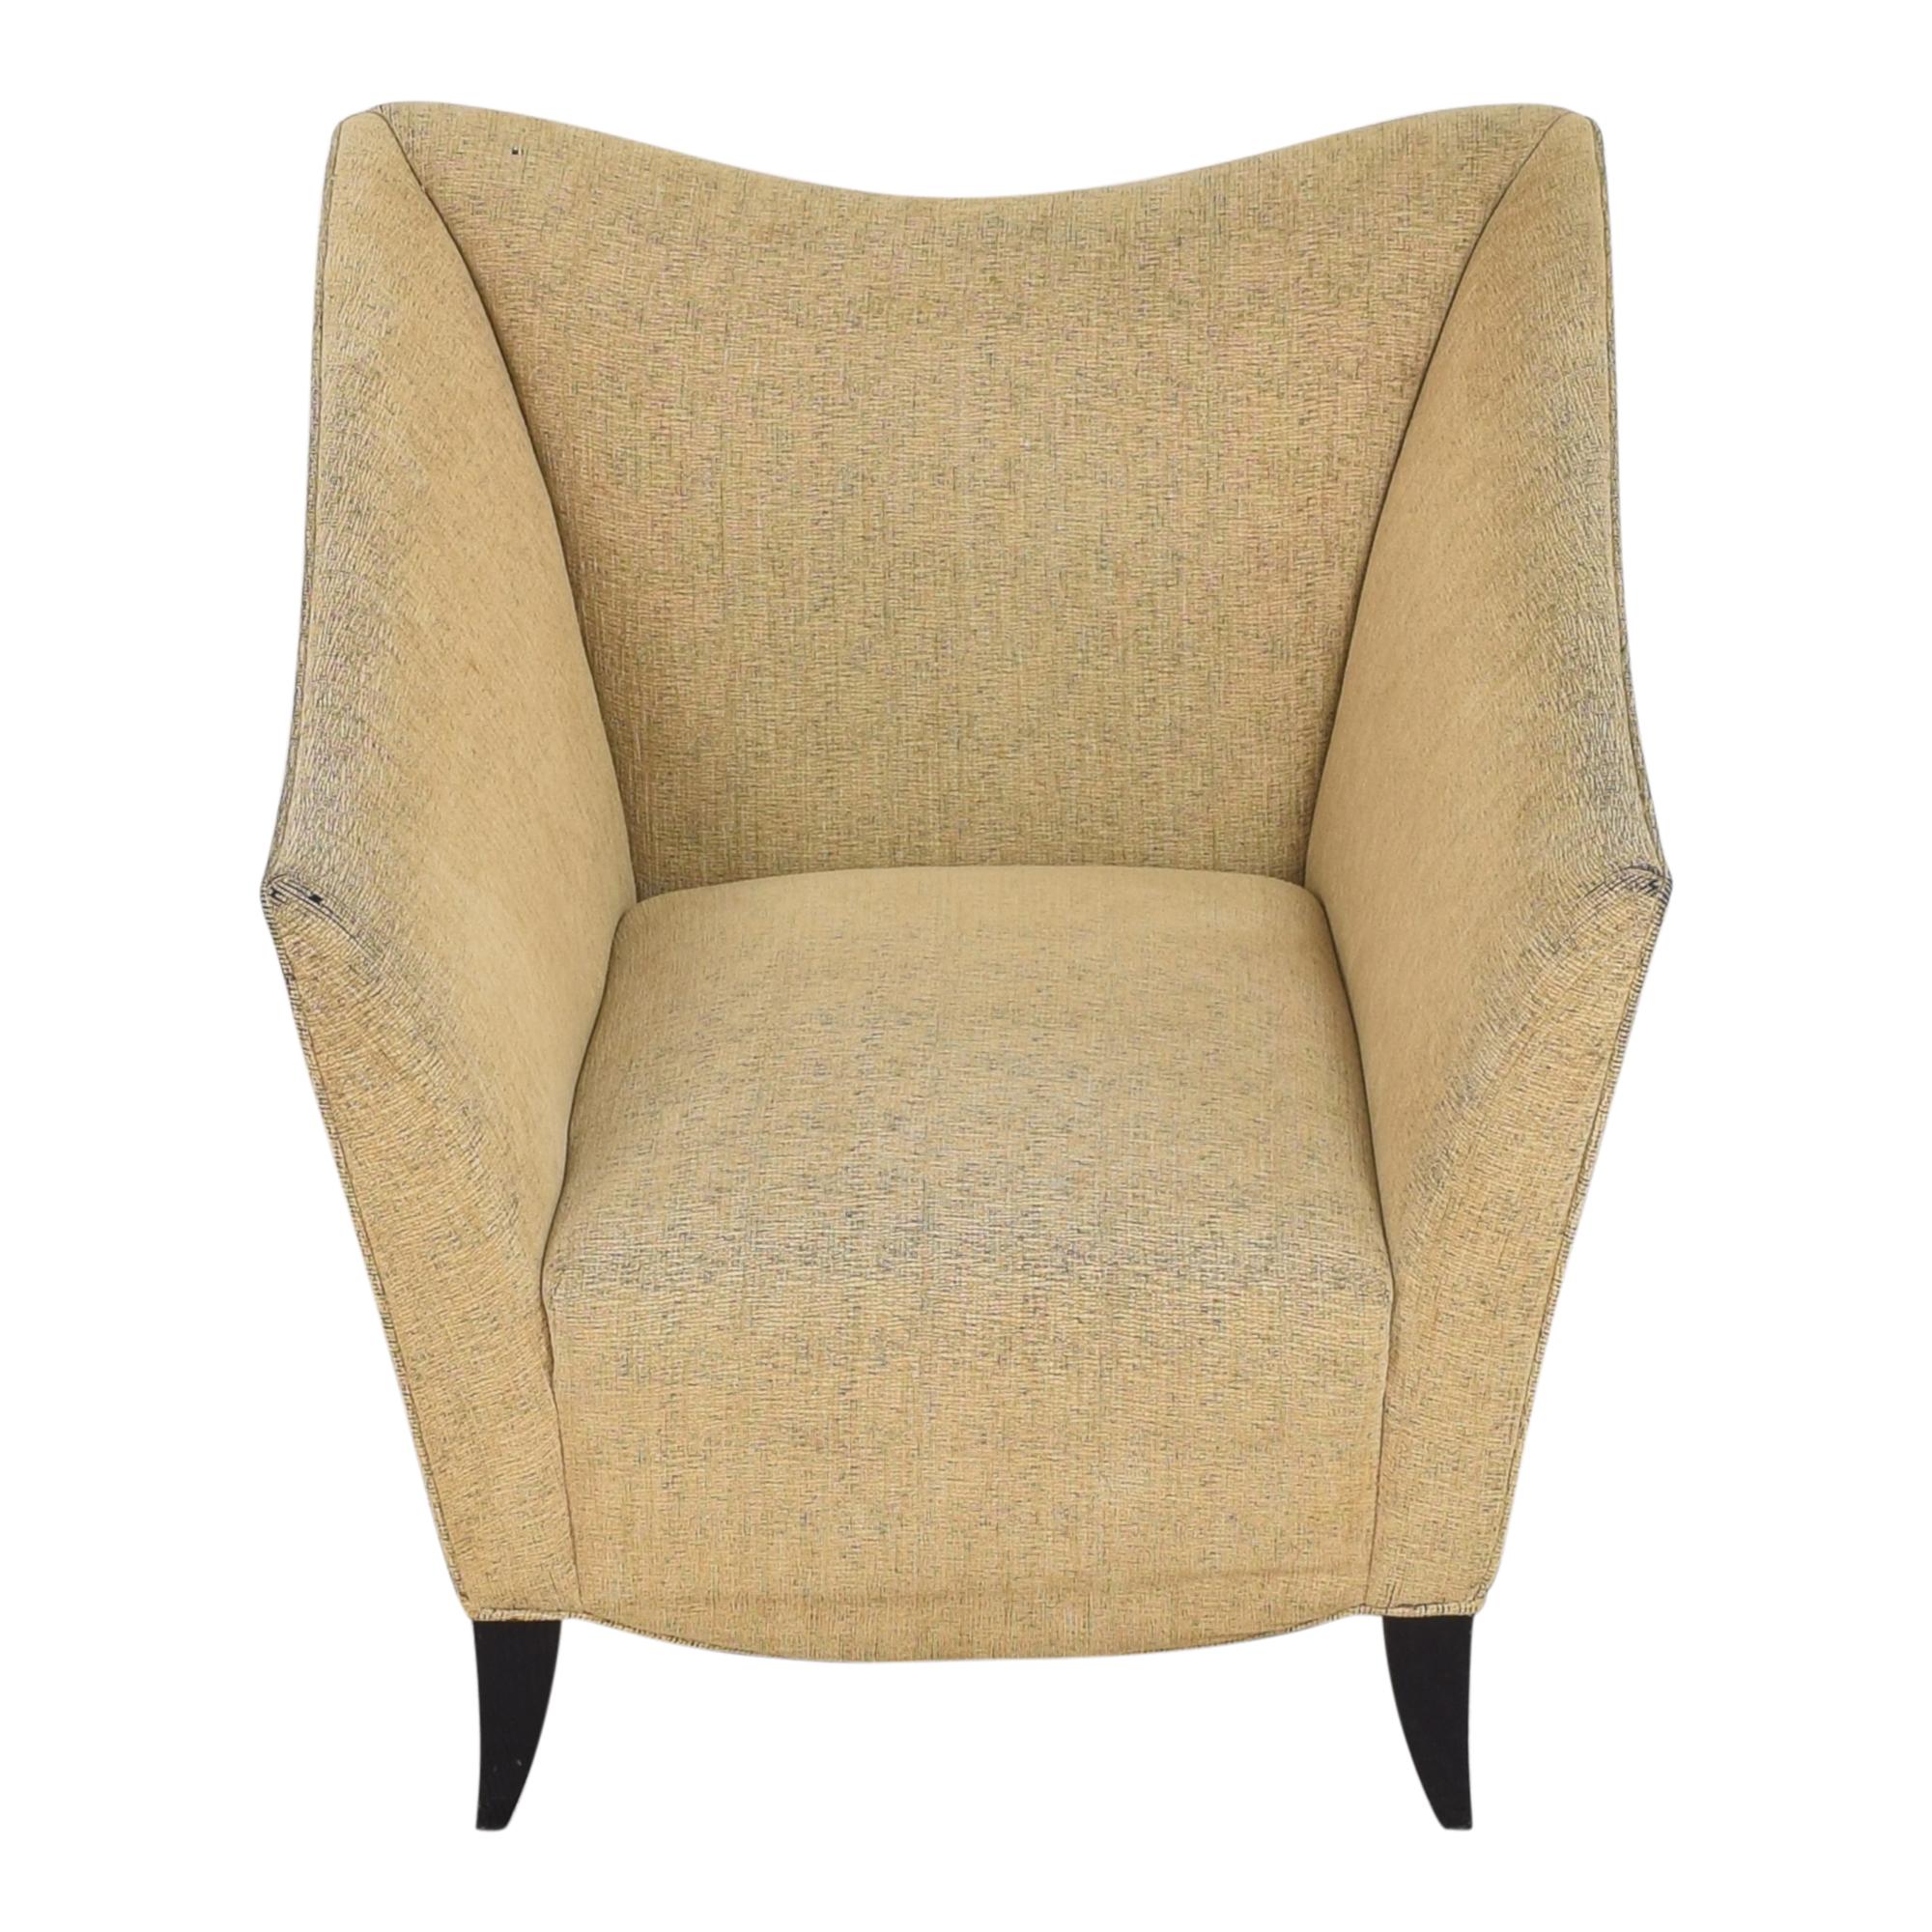 Swaim Swaim Accent Chair pa